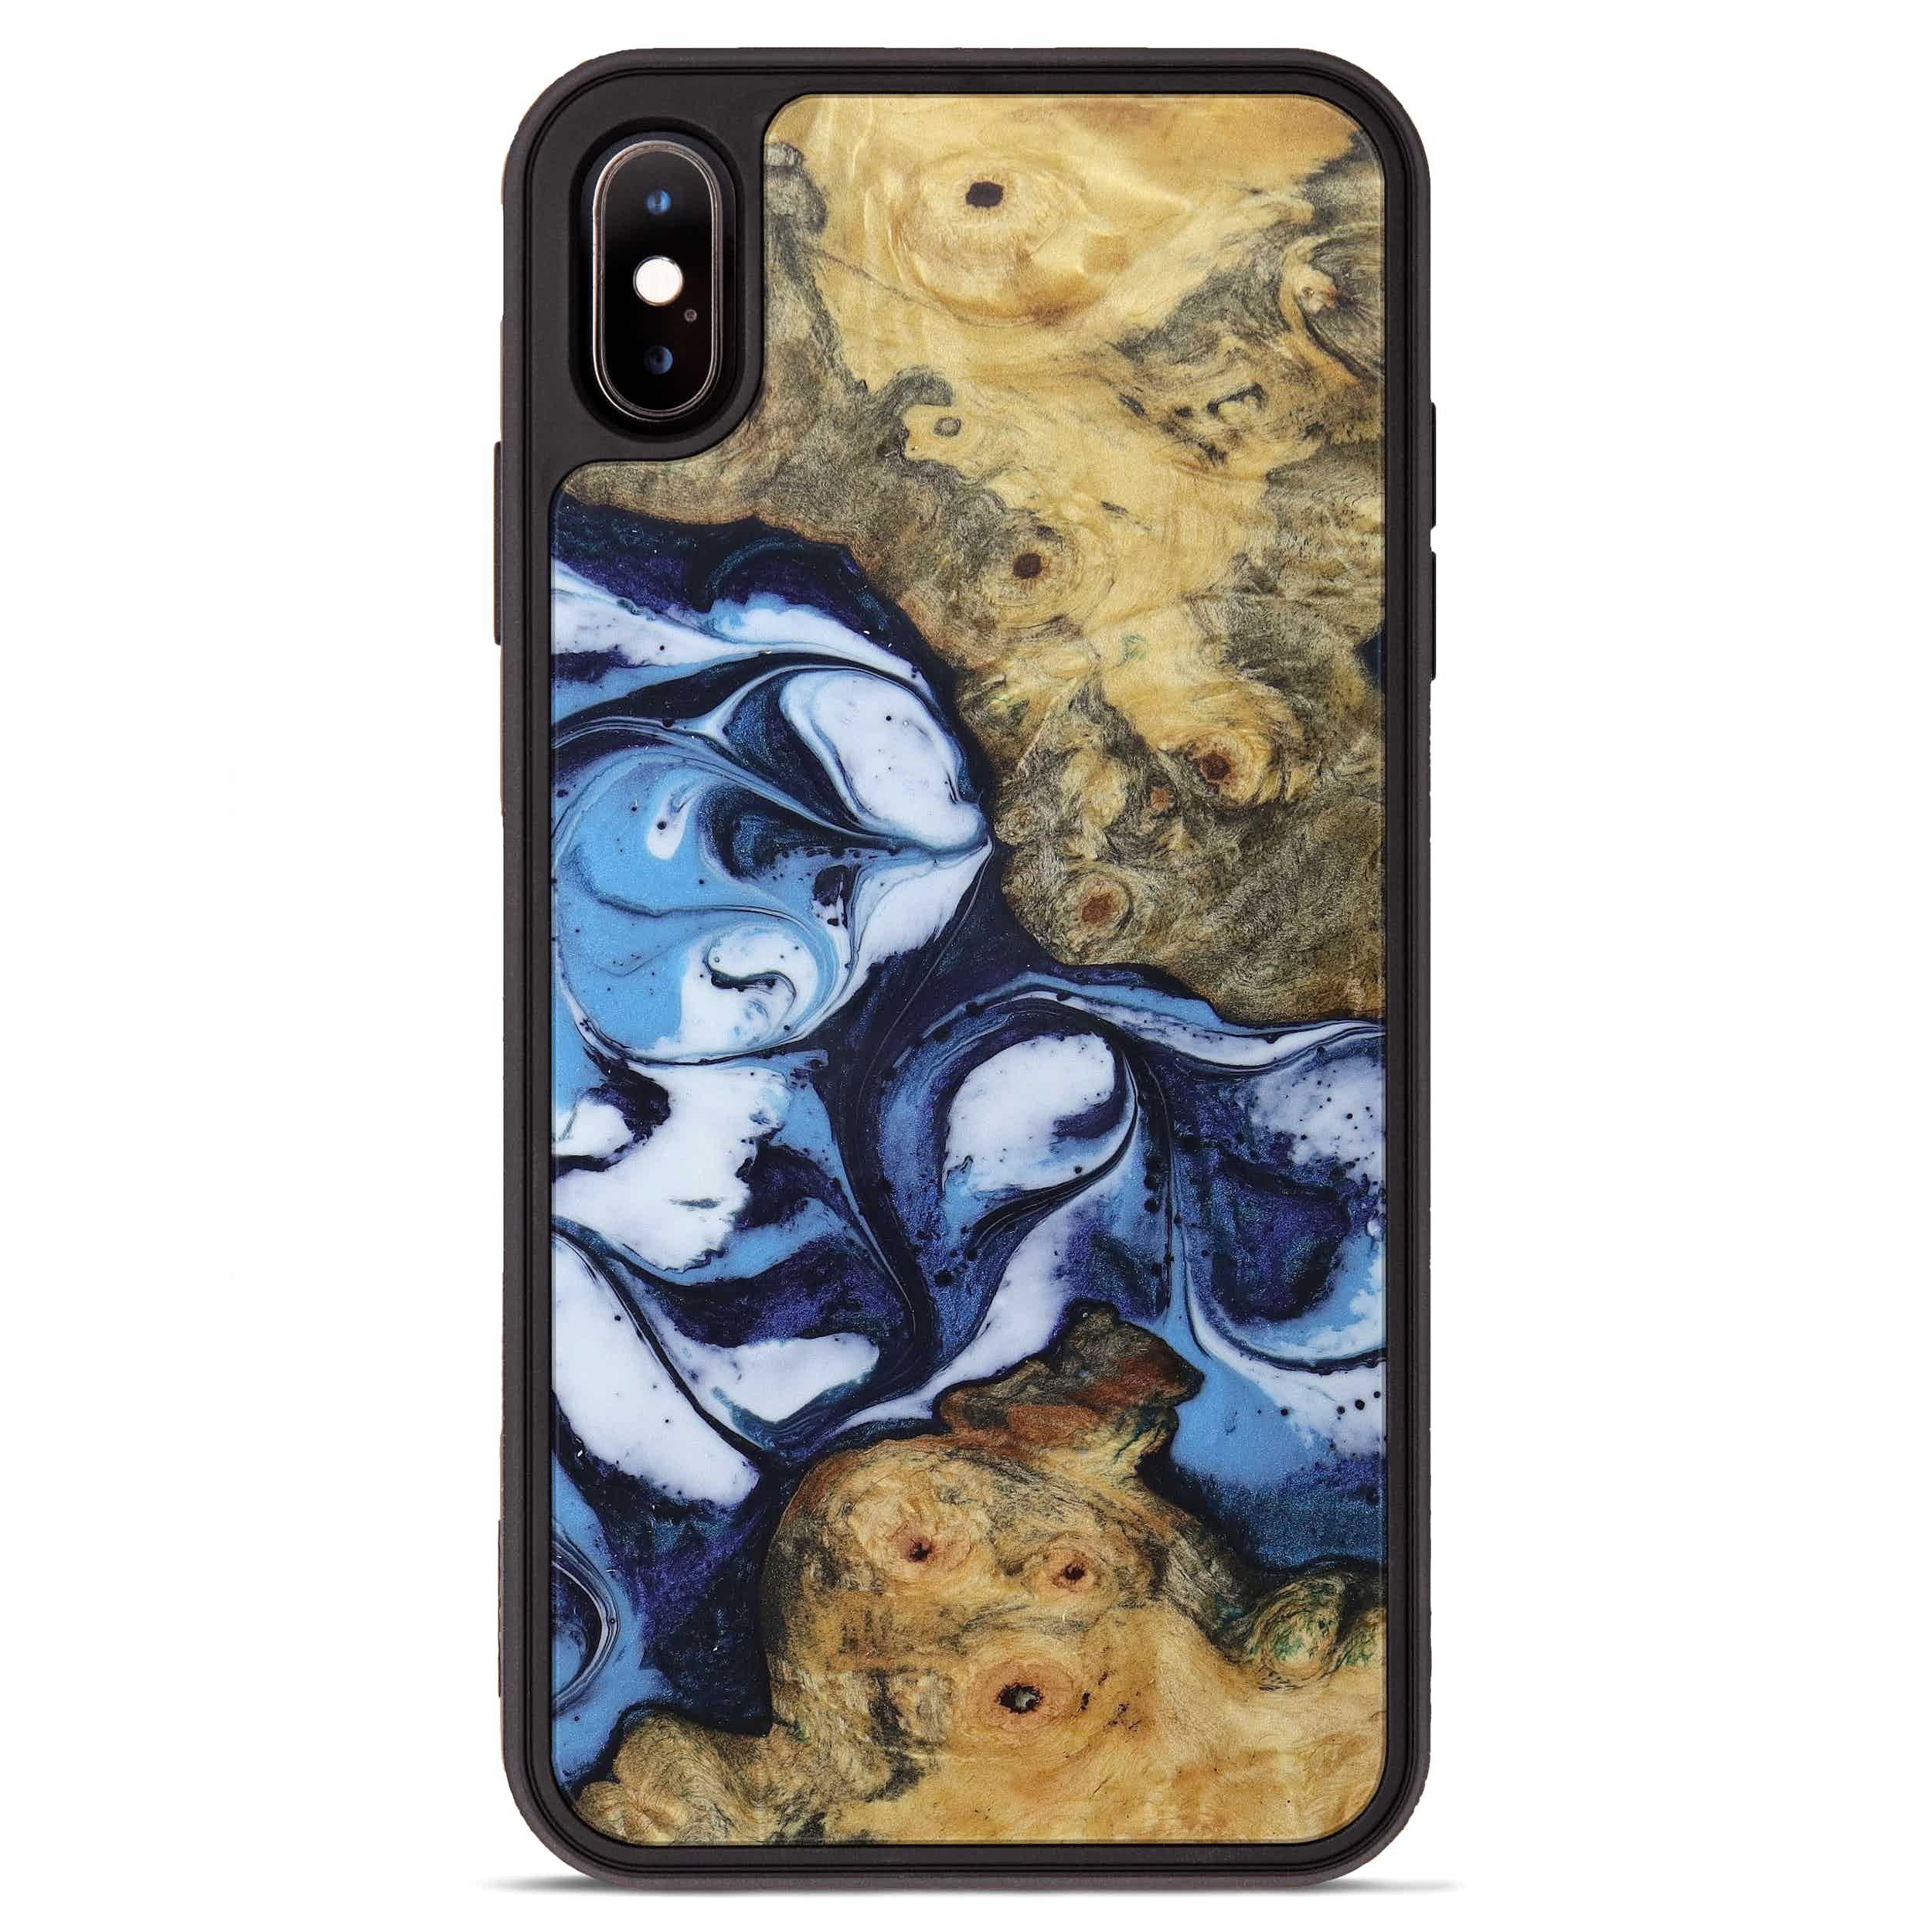 iPhone Xs Max Wood+Resin Phone Case - Midge (Dark Blue, 394889)